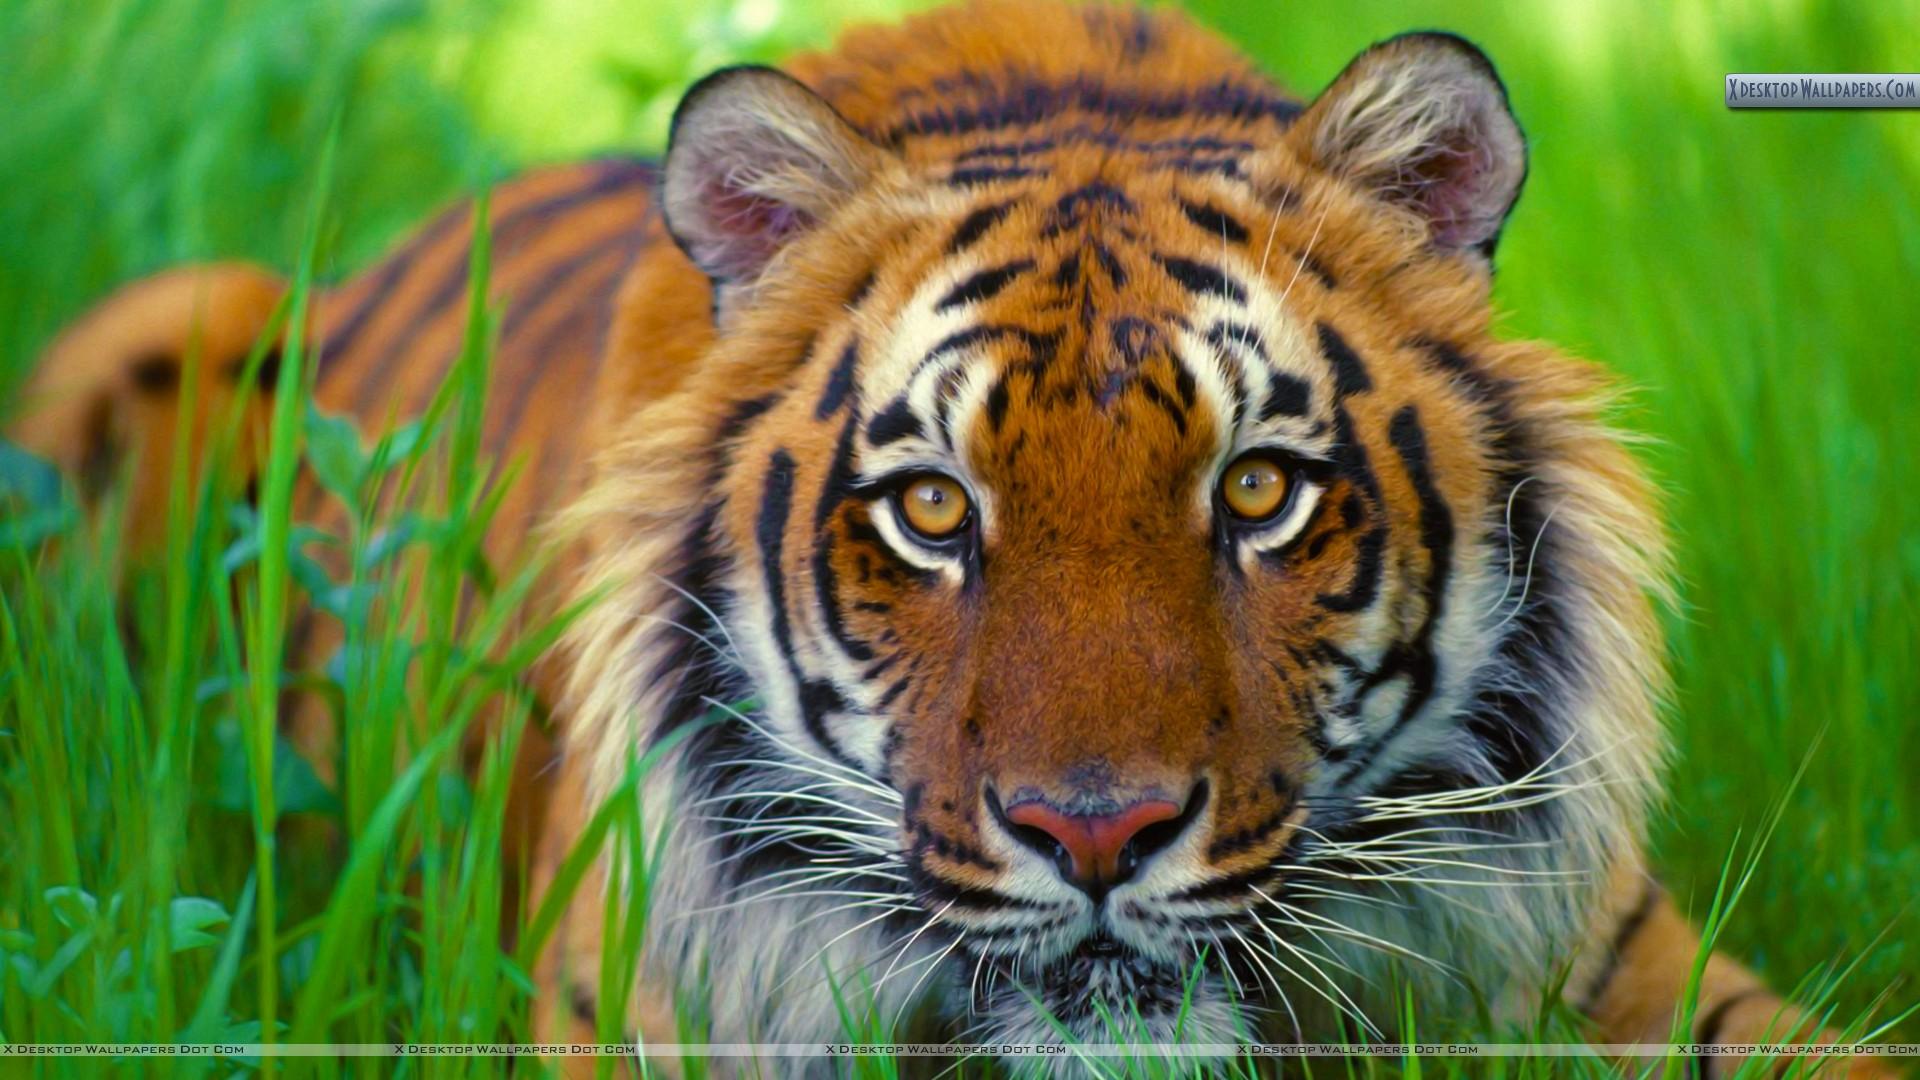 Bengal Tiger Up Close 1920x1080 Wallpaper Teahub Io